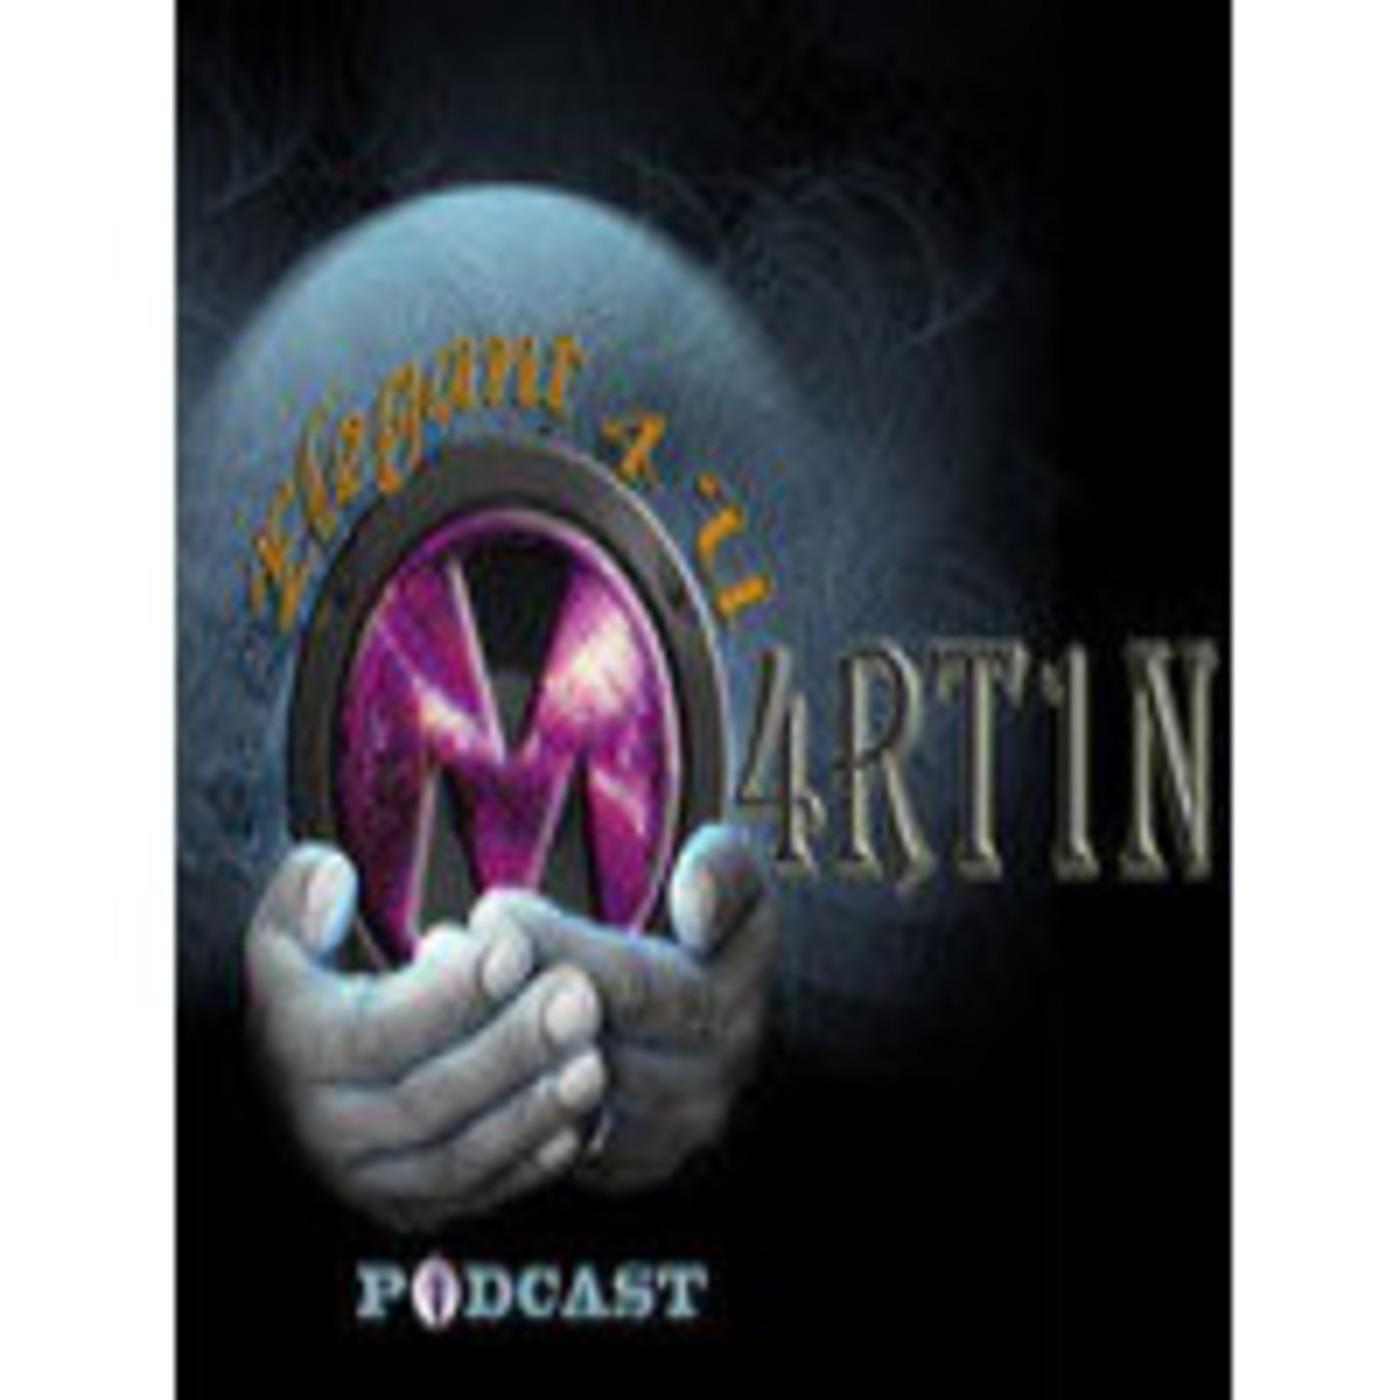 <![CDATA[Elegant 4 U Podcast 2]]>